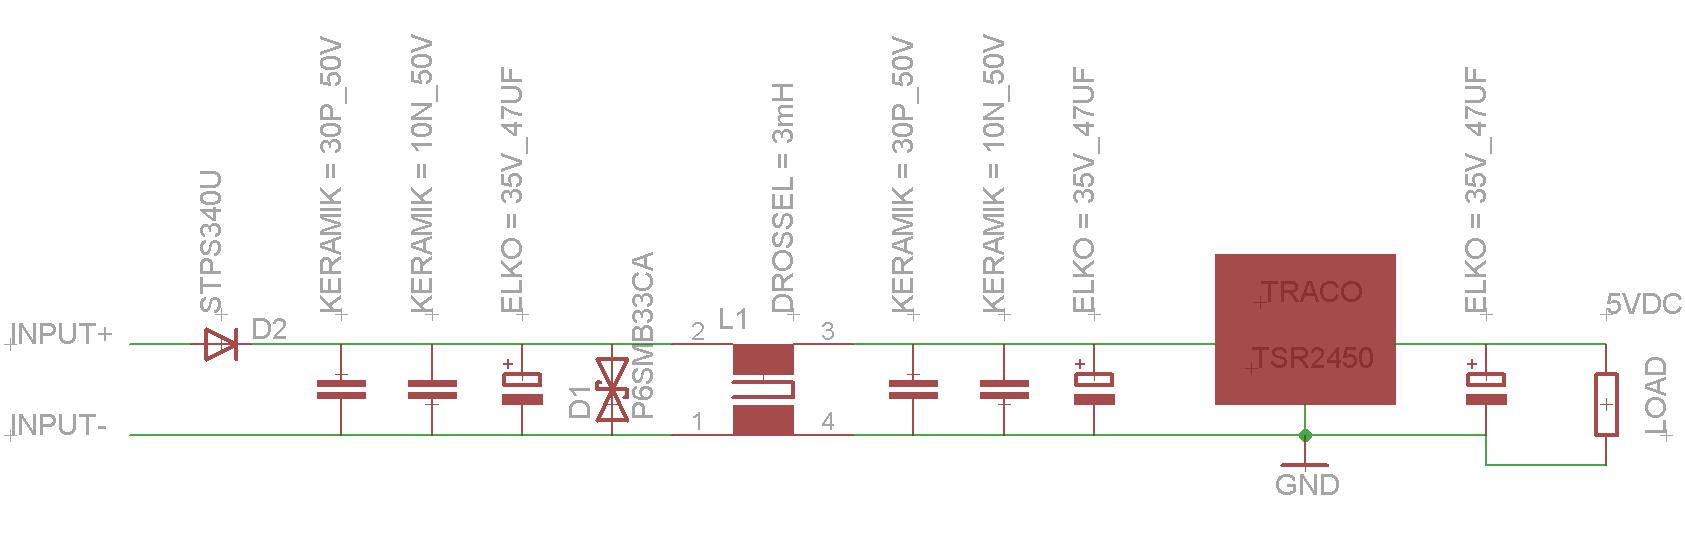 Großzügig Schaltplan Am Drosselanschlag Ideen - Elektrische ...